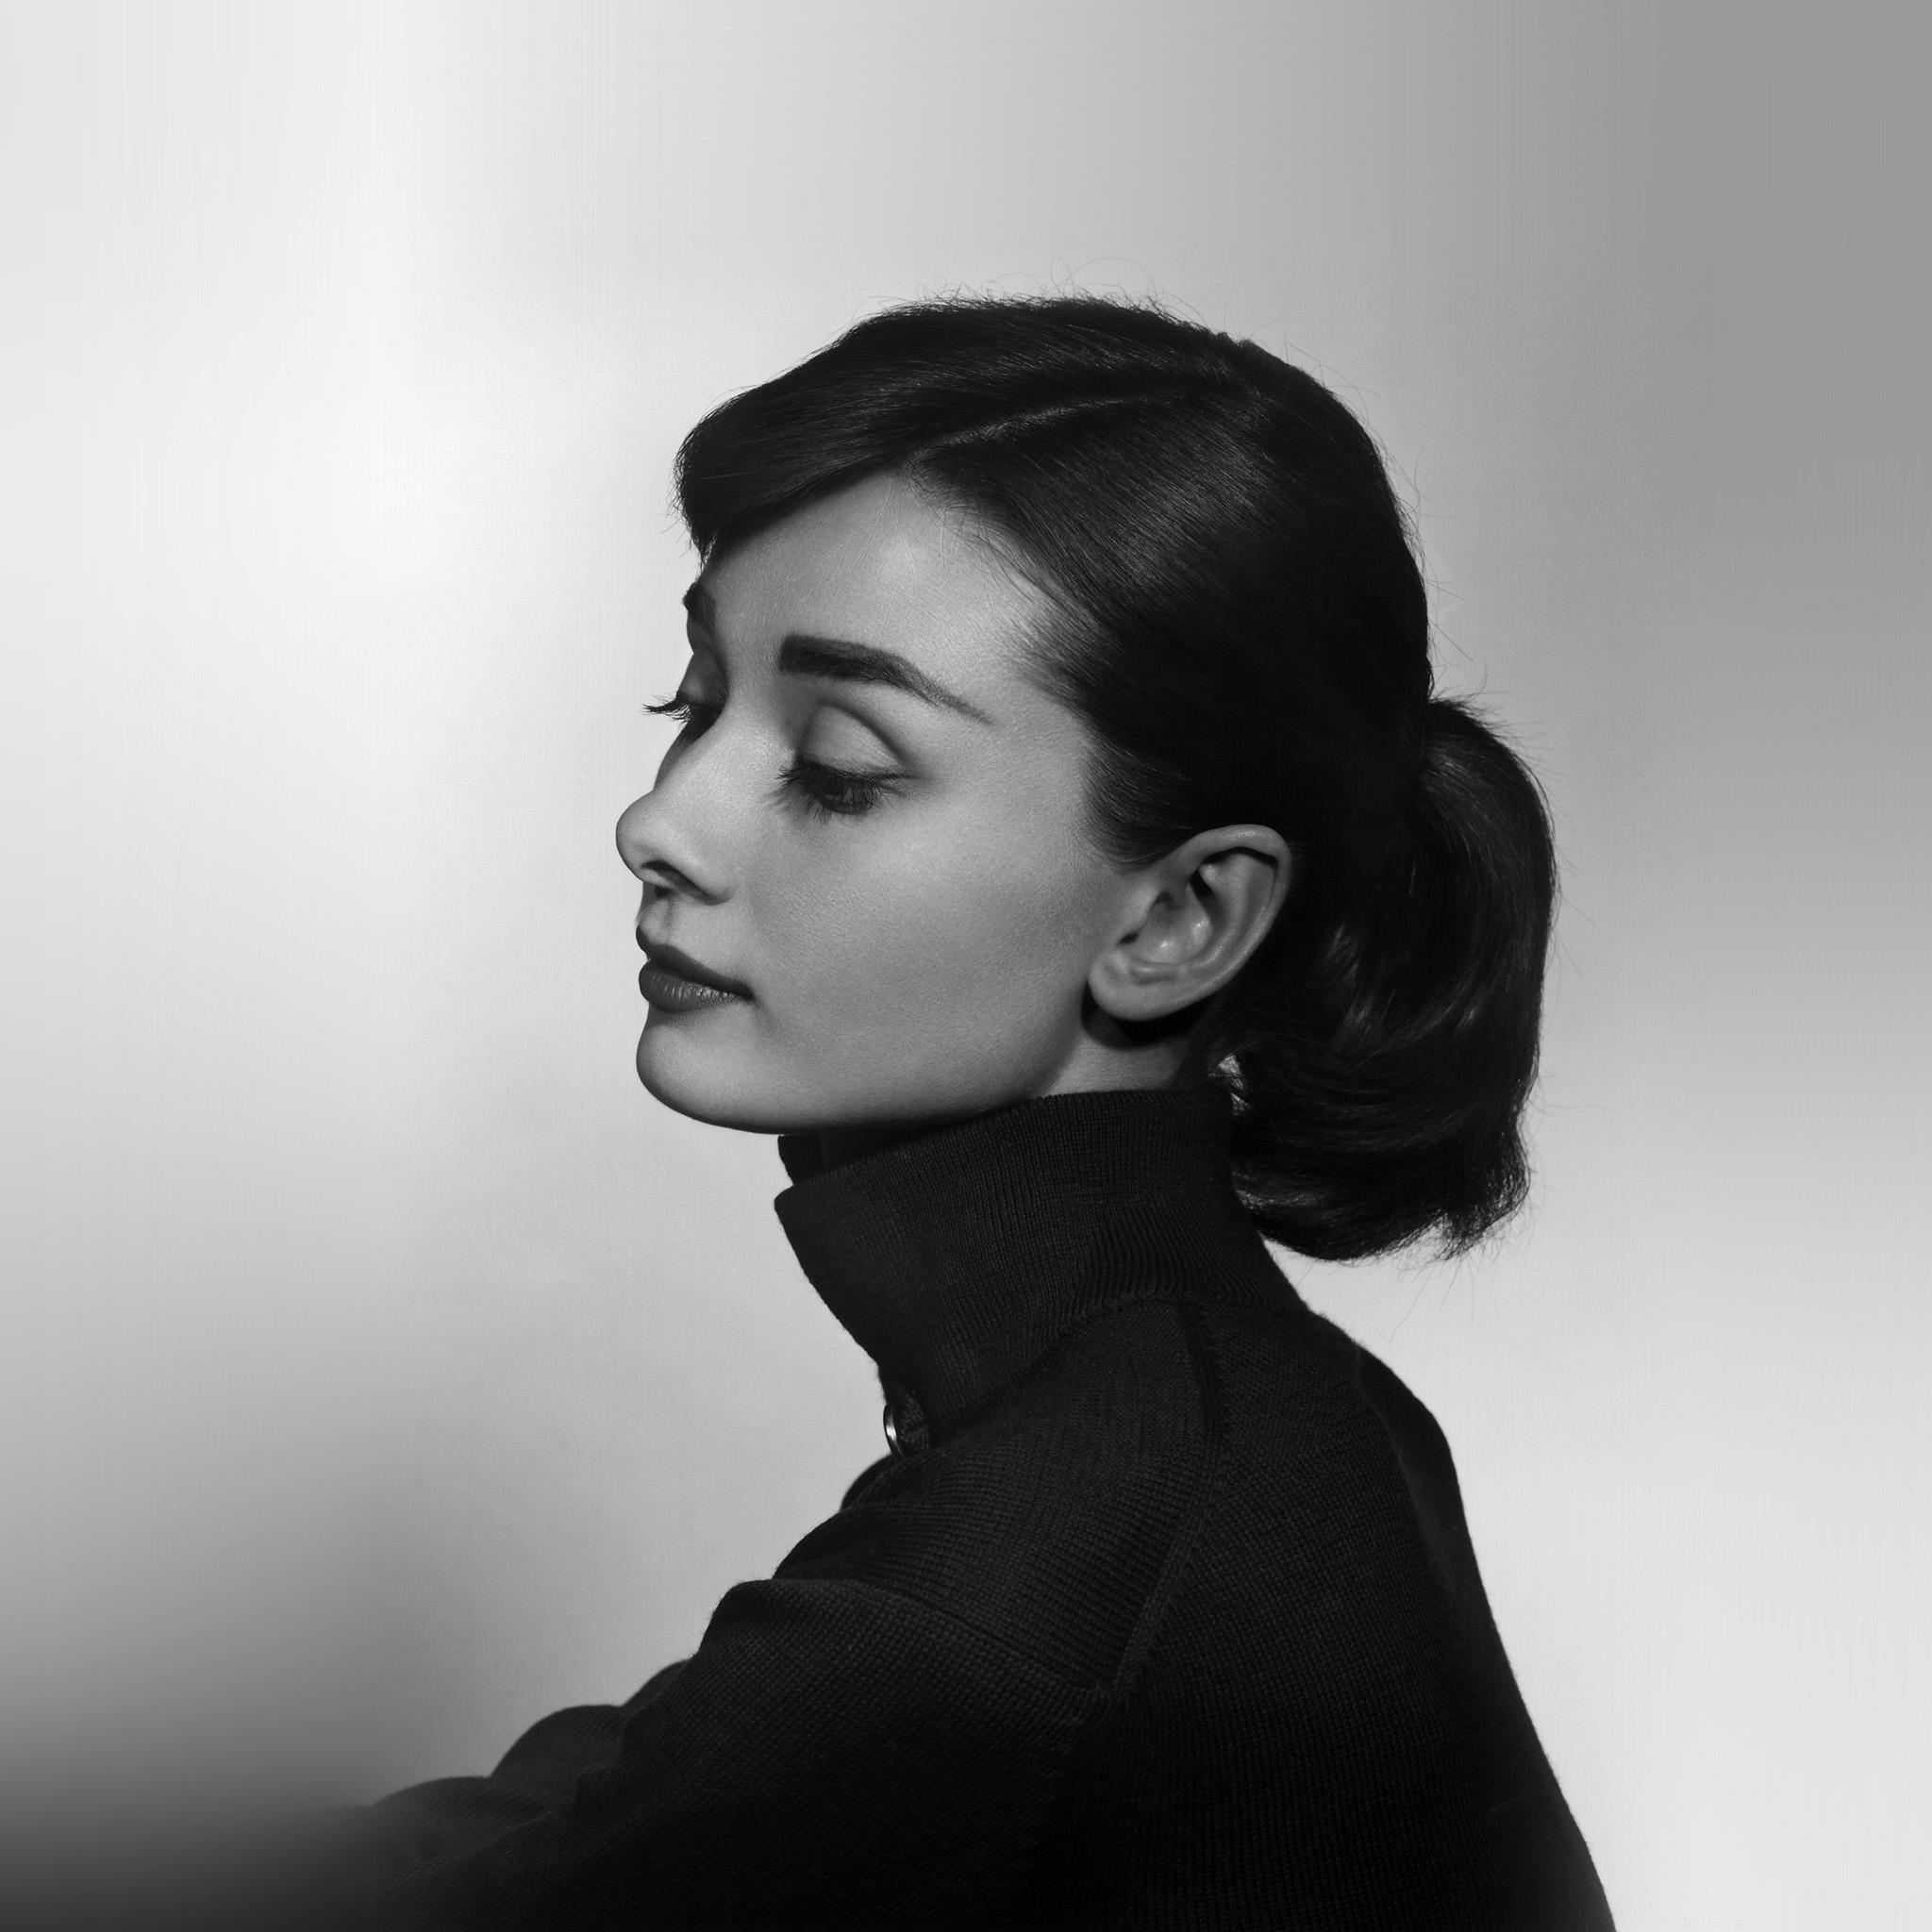 Blackberry Black Wallpaper Hn97 Audrey Hepburn Bw Film Dark Wallpaper